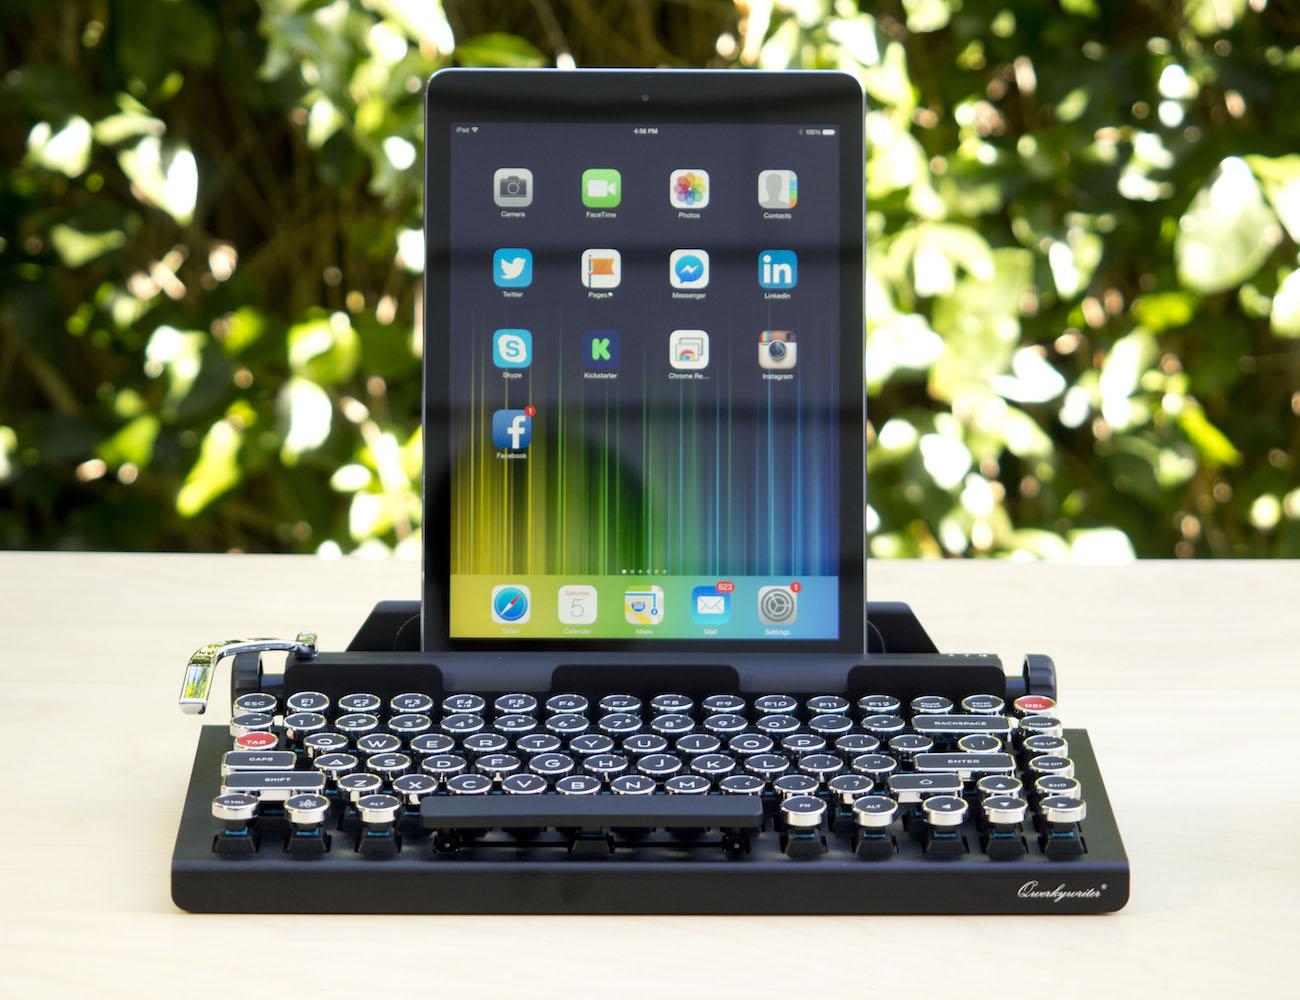 The Qwerkywriter Bluetooth Keyboard